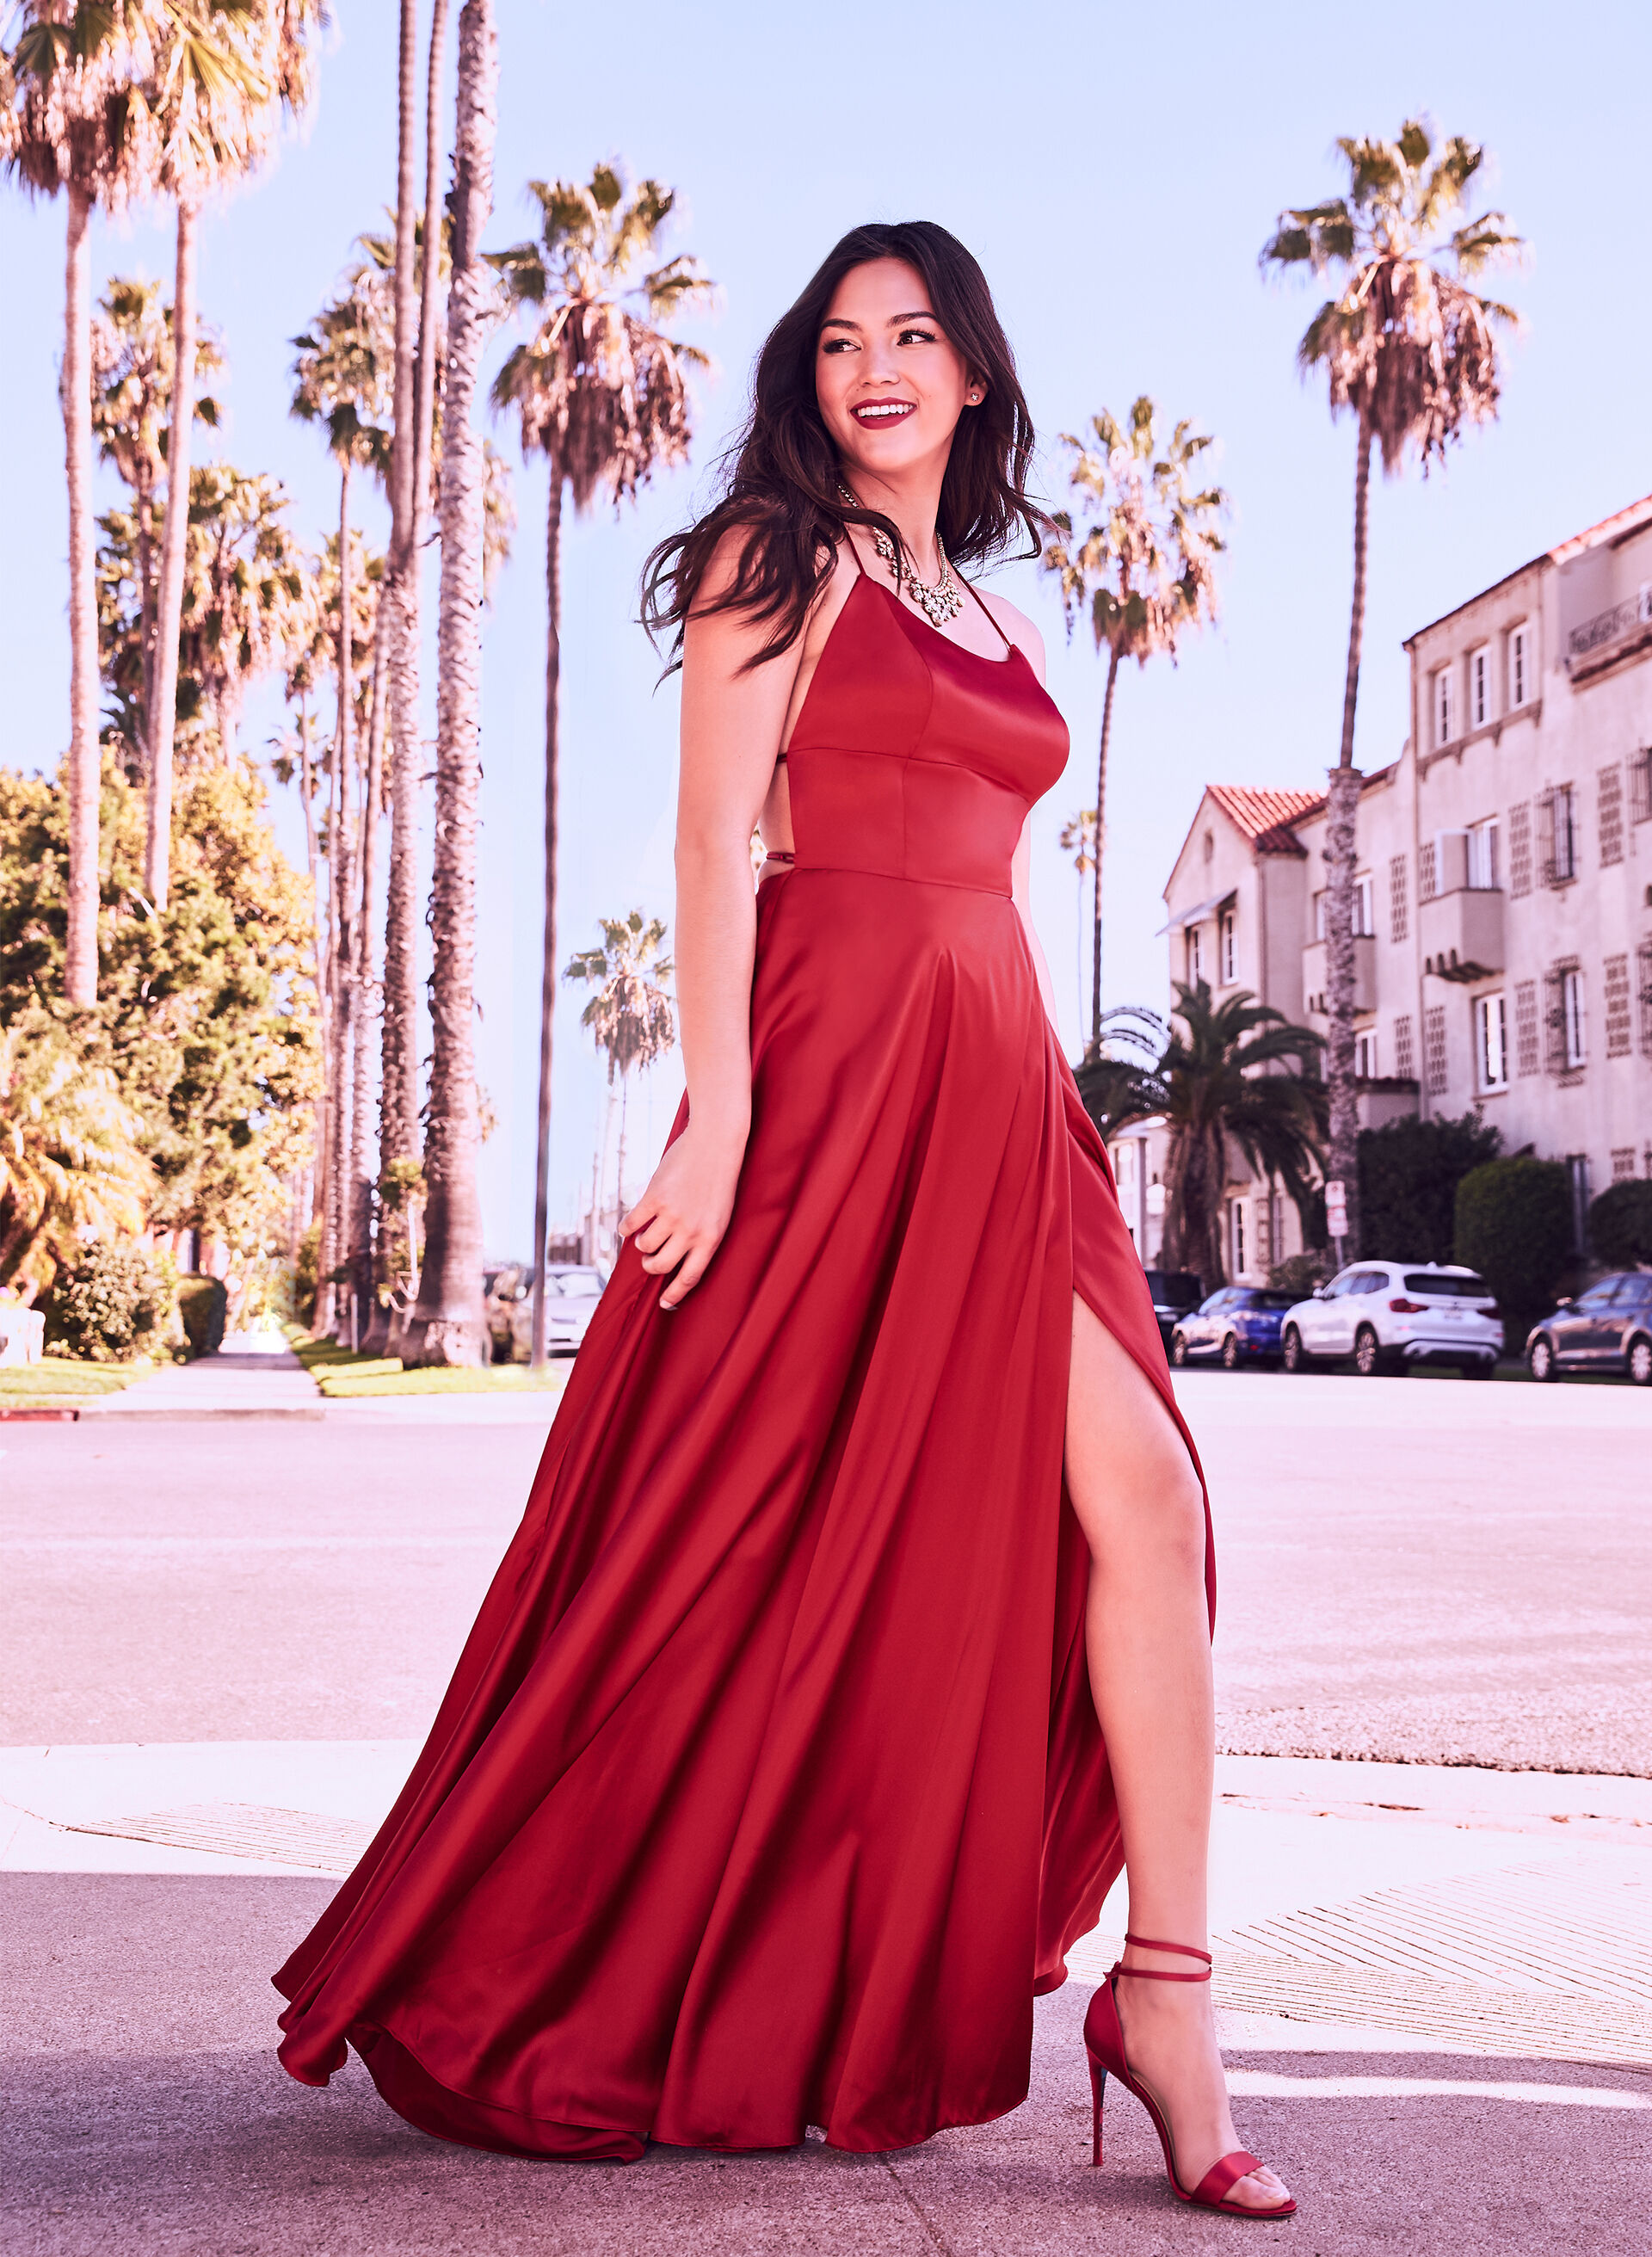 Lady Red Dress